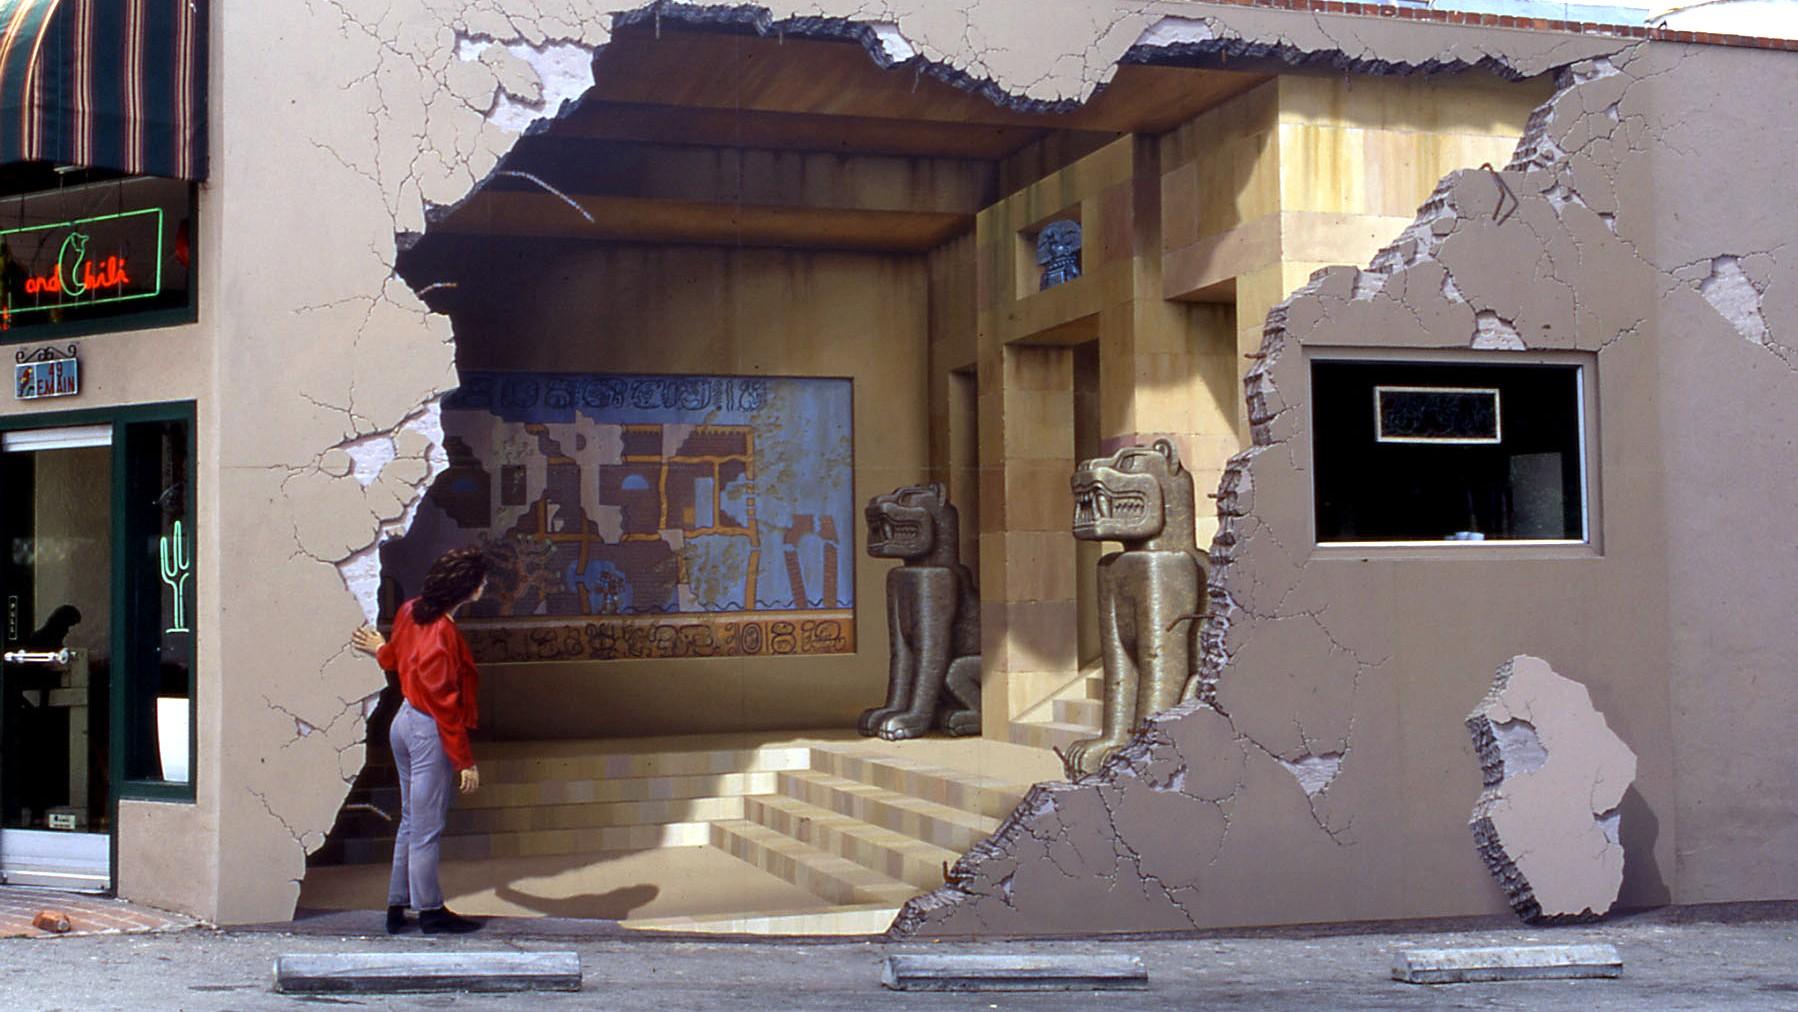 God Hand 3d Wallpaper Siete Punto Uno Los Gatos Ca Trompe L Oeil Mural By